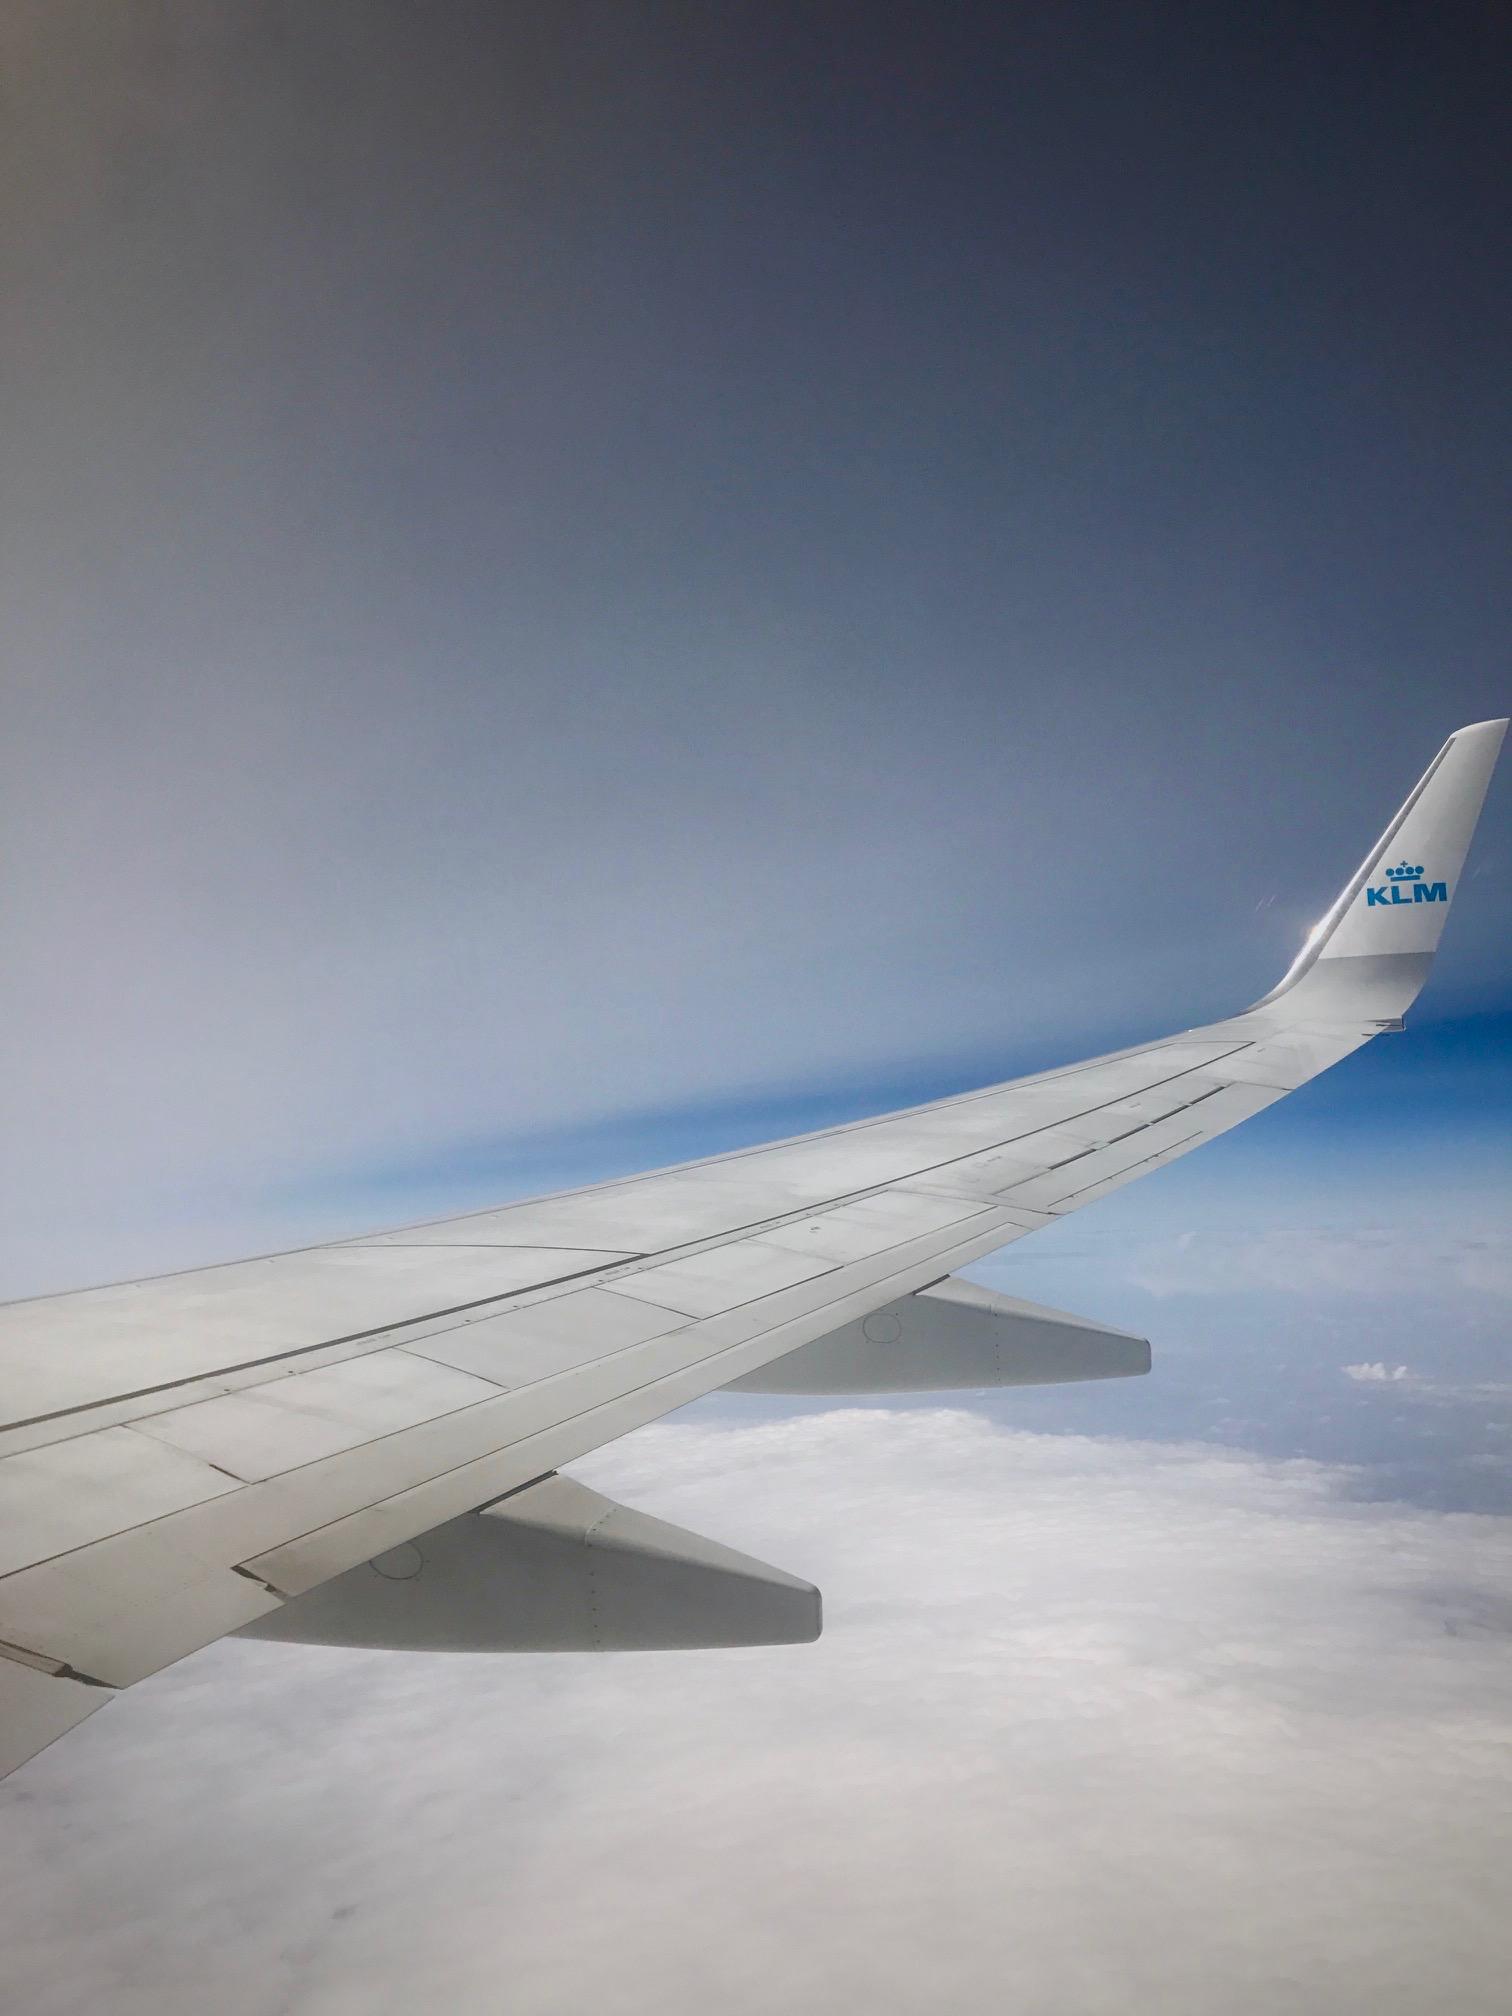 streepje,licht,vleugel,klm,amsterdam,valancia,perceptie,advandenboom,kl1715,flyingdutchman,flying,dutch